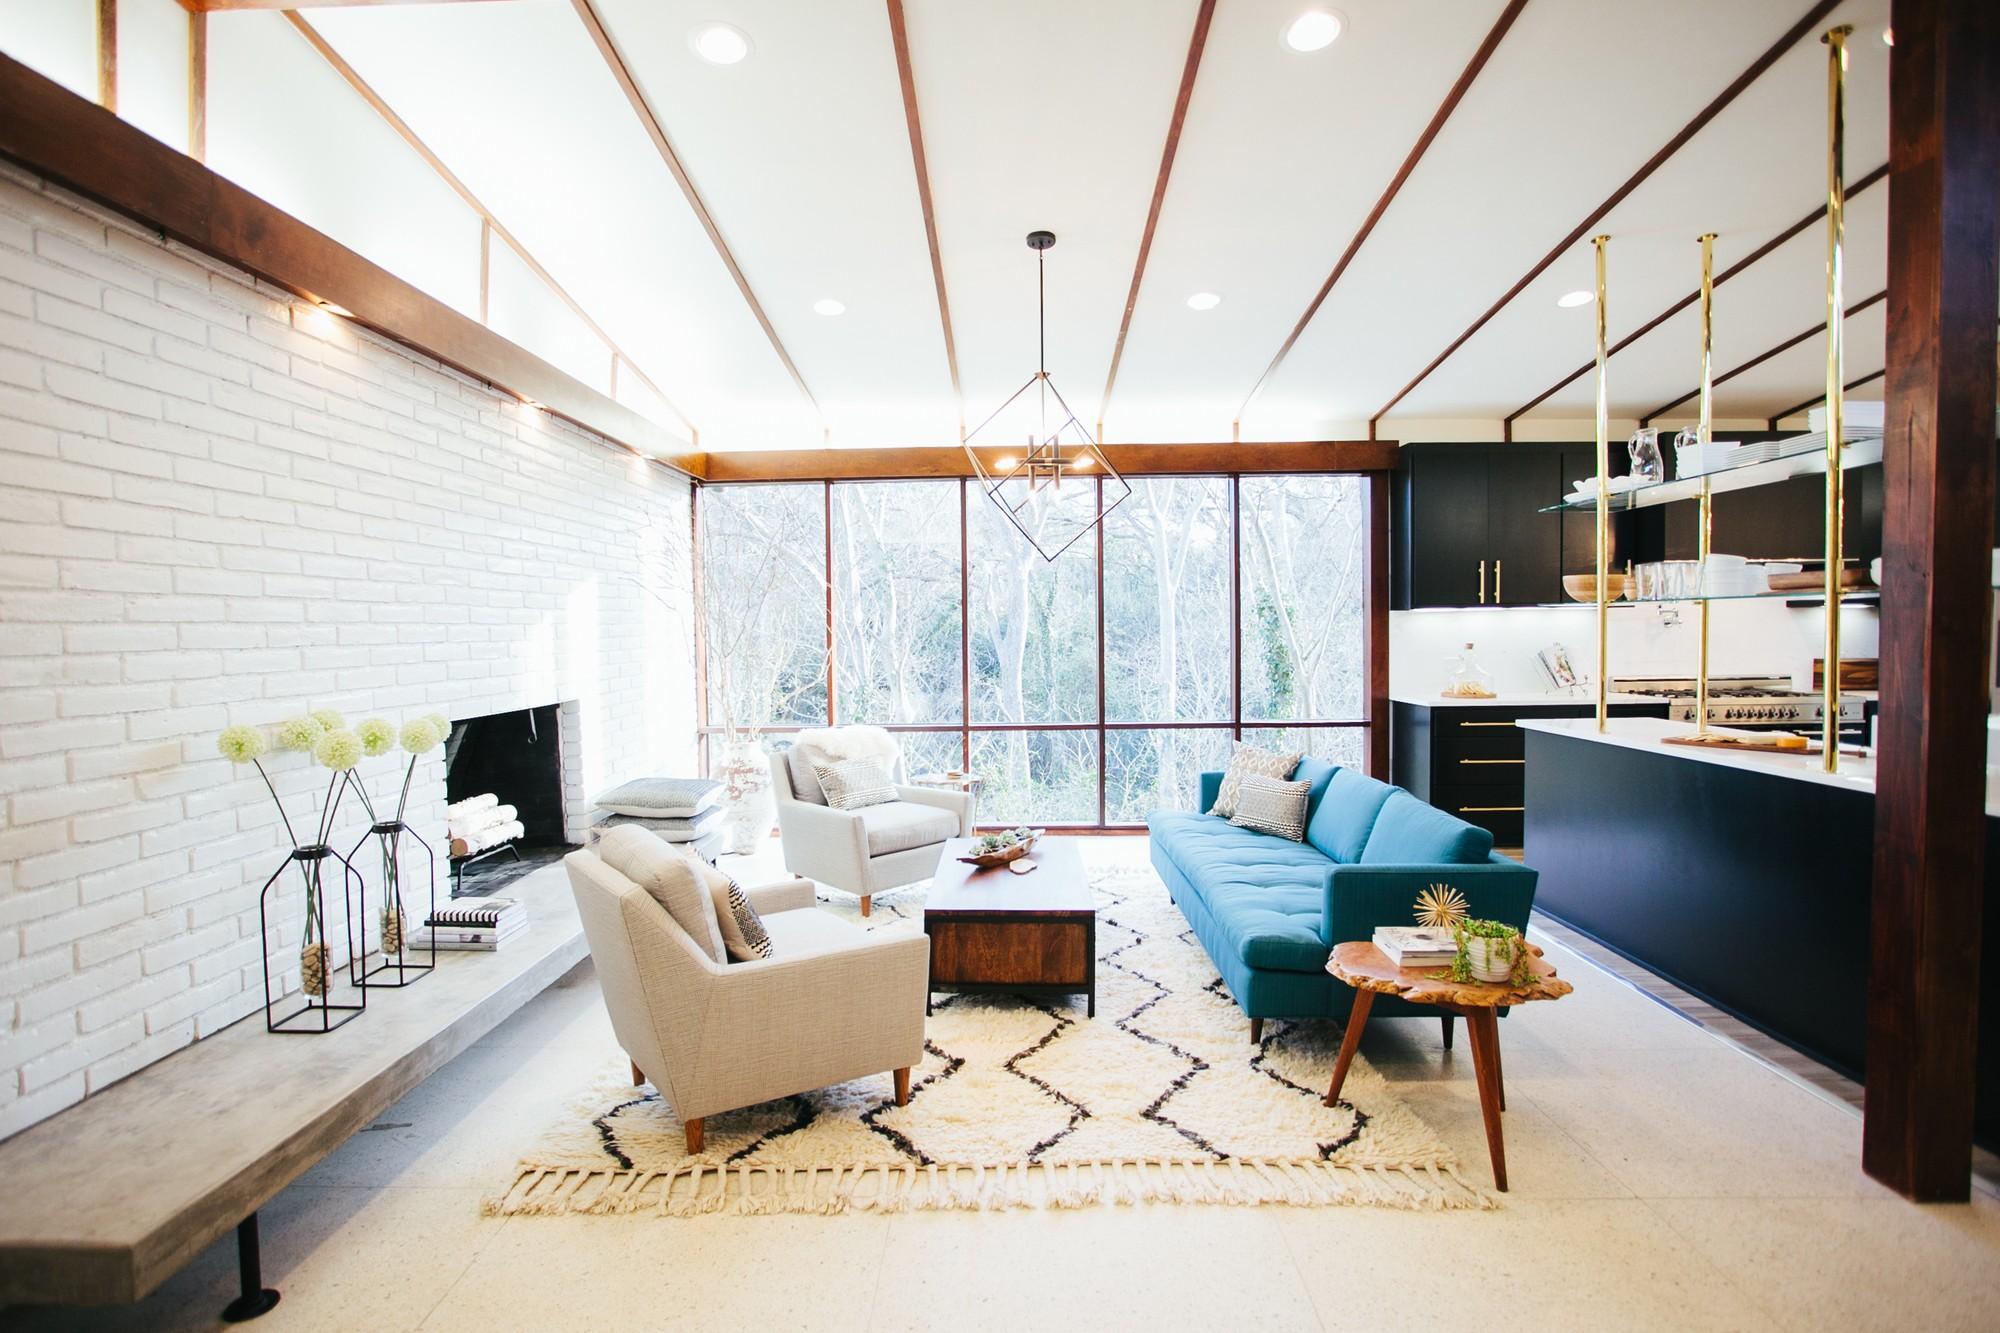 Mid-Century Modern living room from HGTV's Fixer Upper.